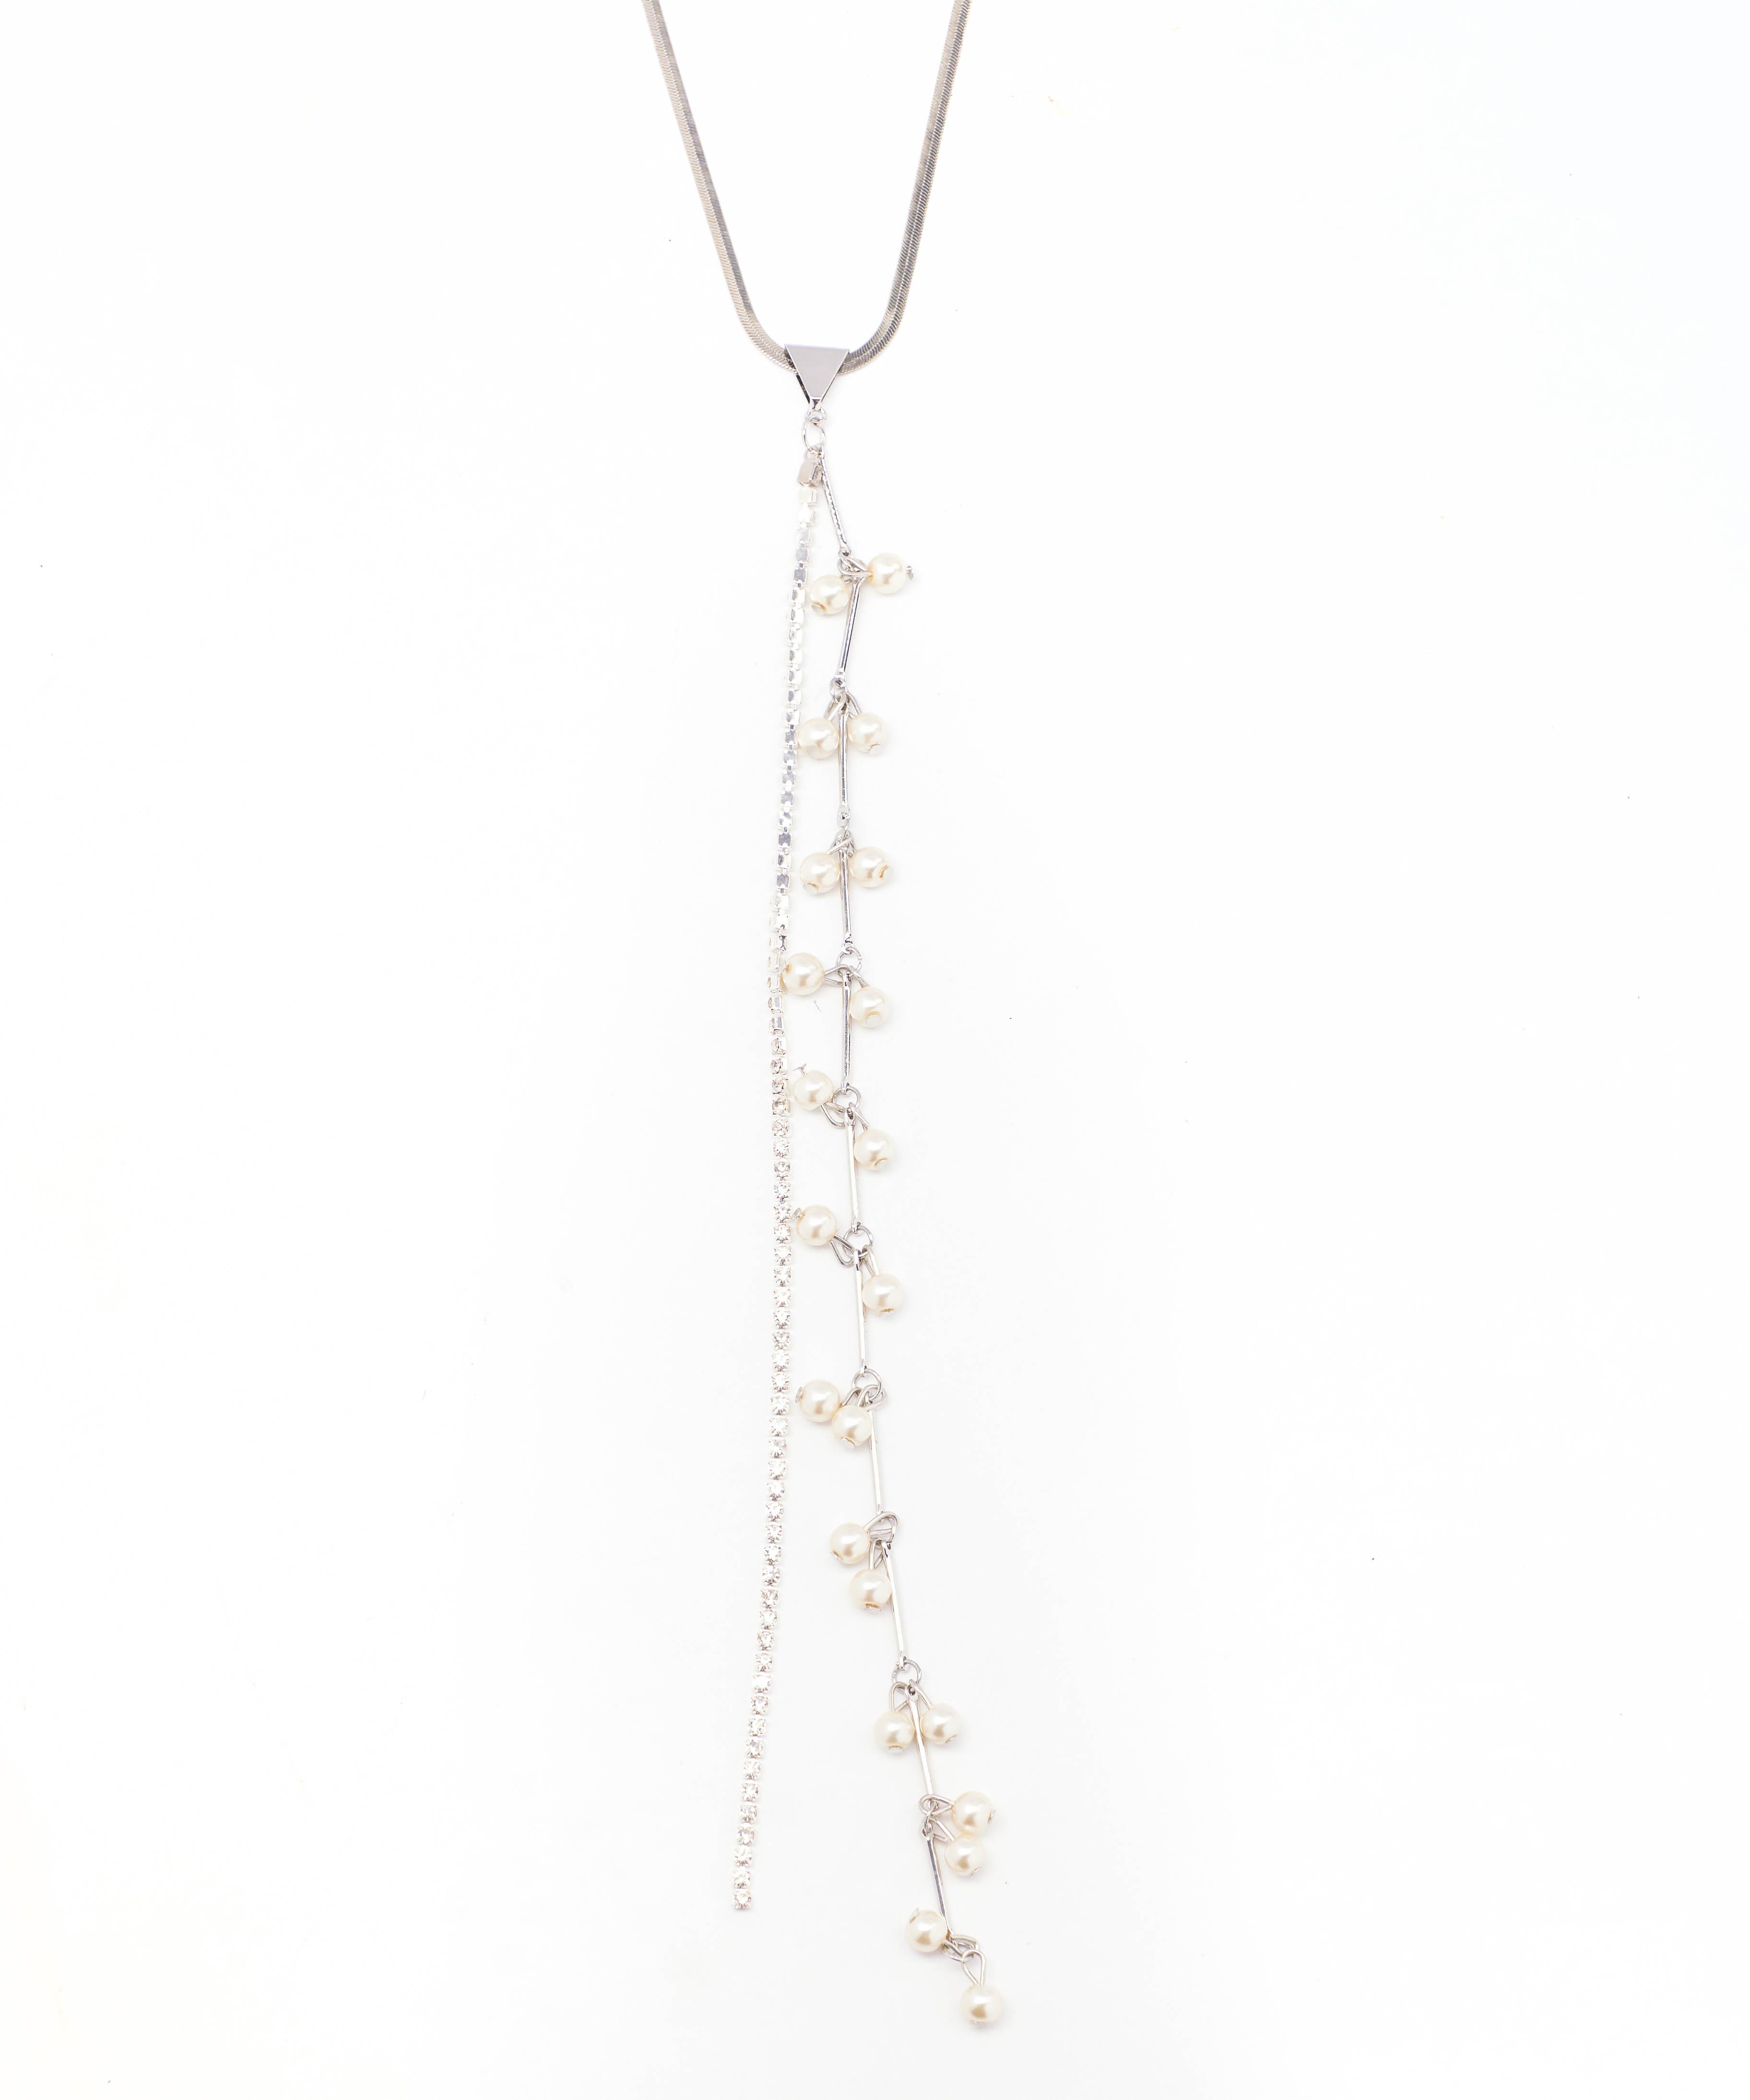 Bijoux Femme - Collier Argent Jina - Nl81796